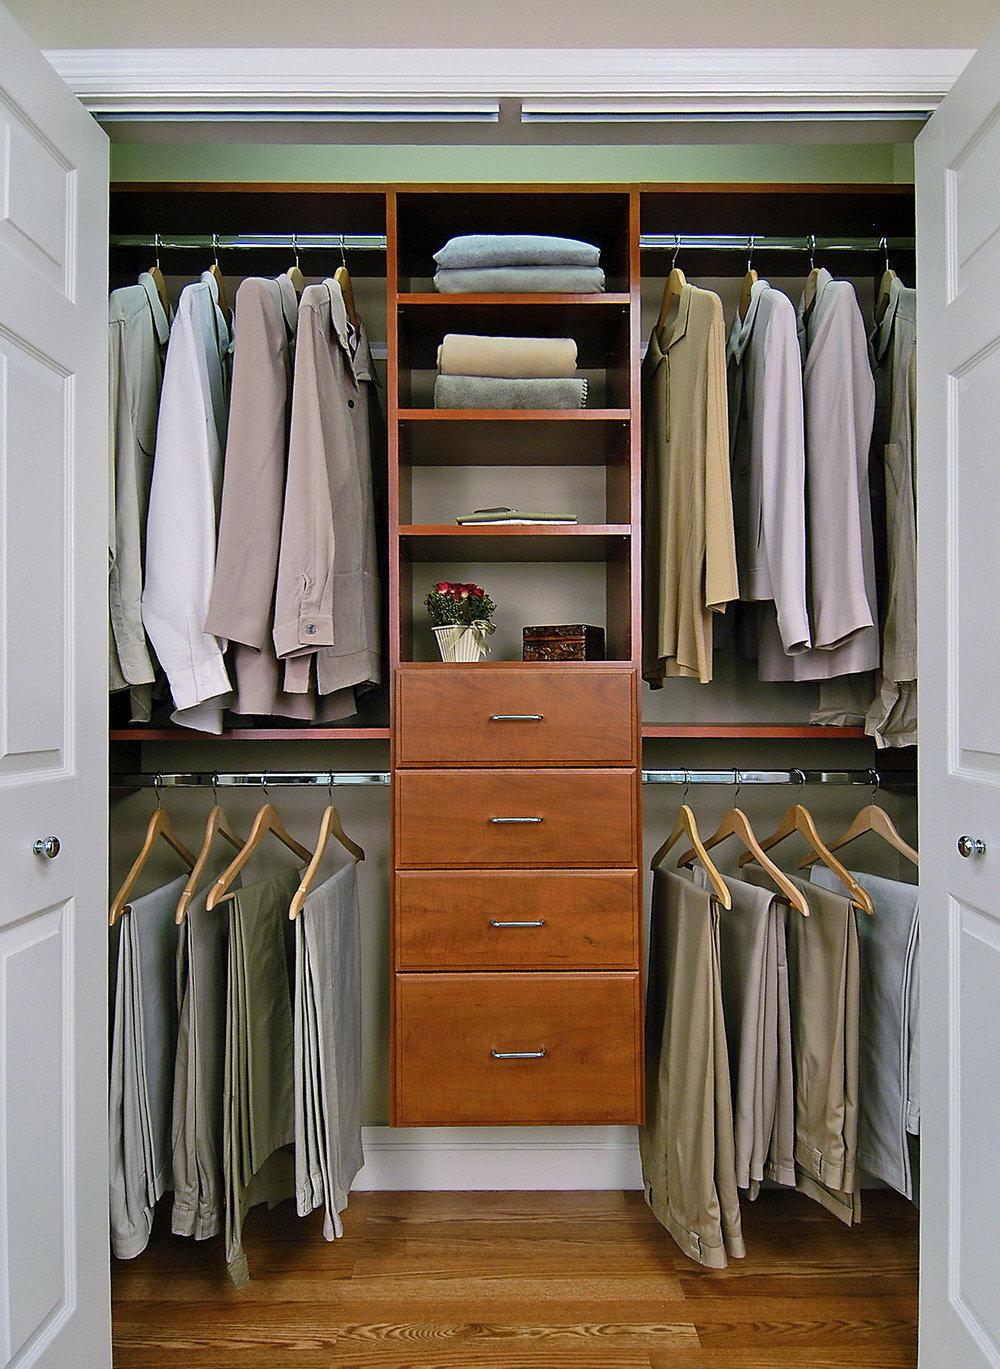 Design Your Own Closet Online Free